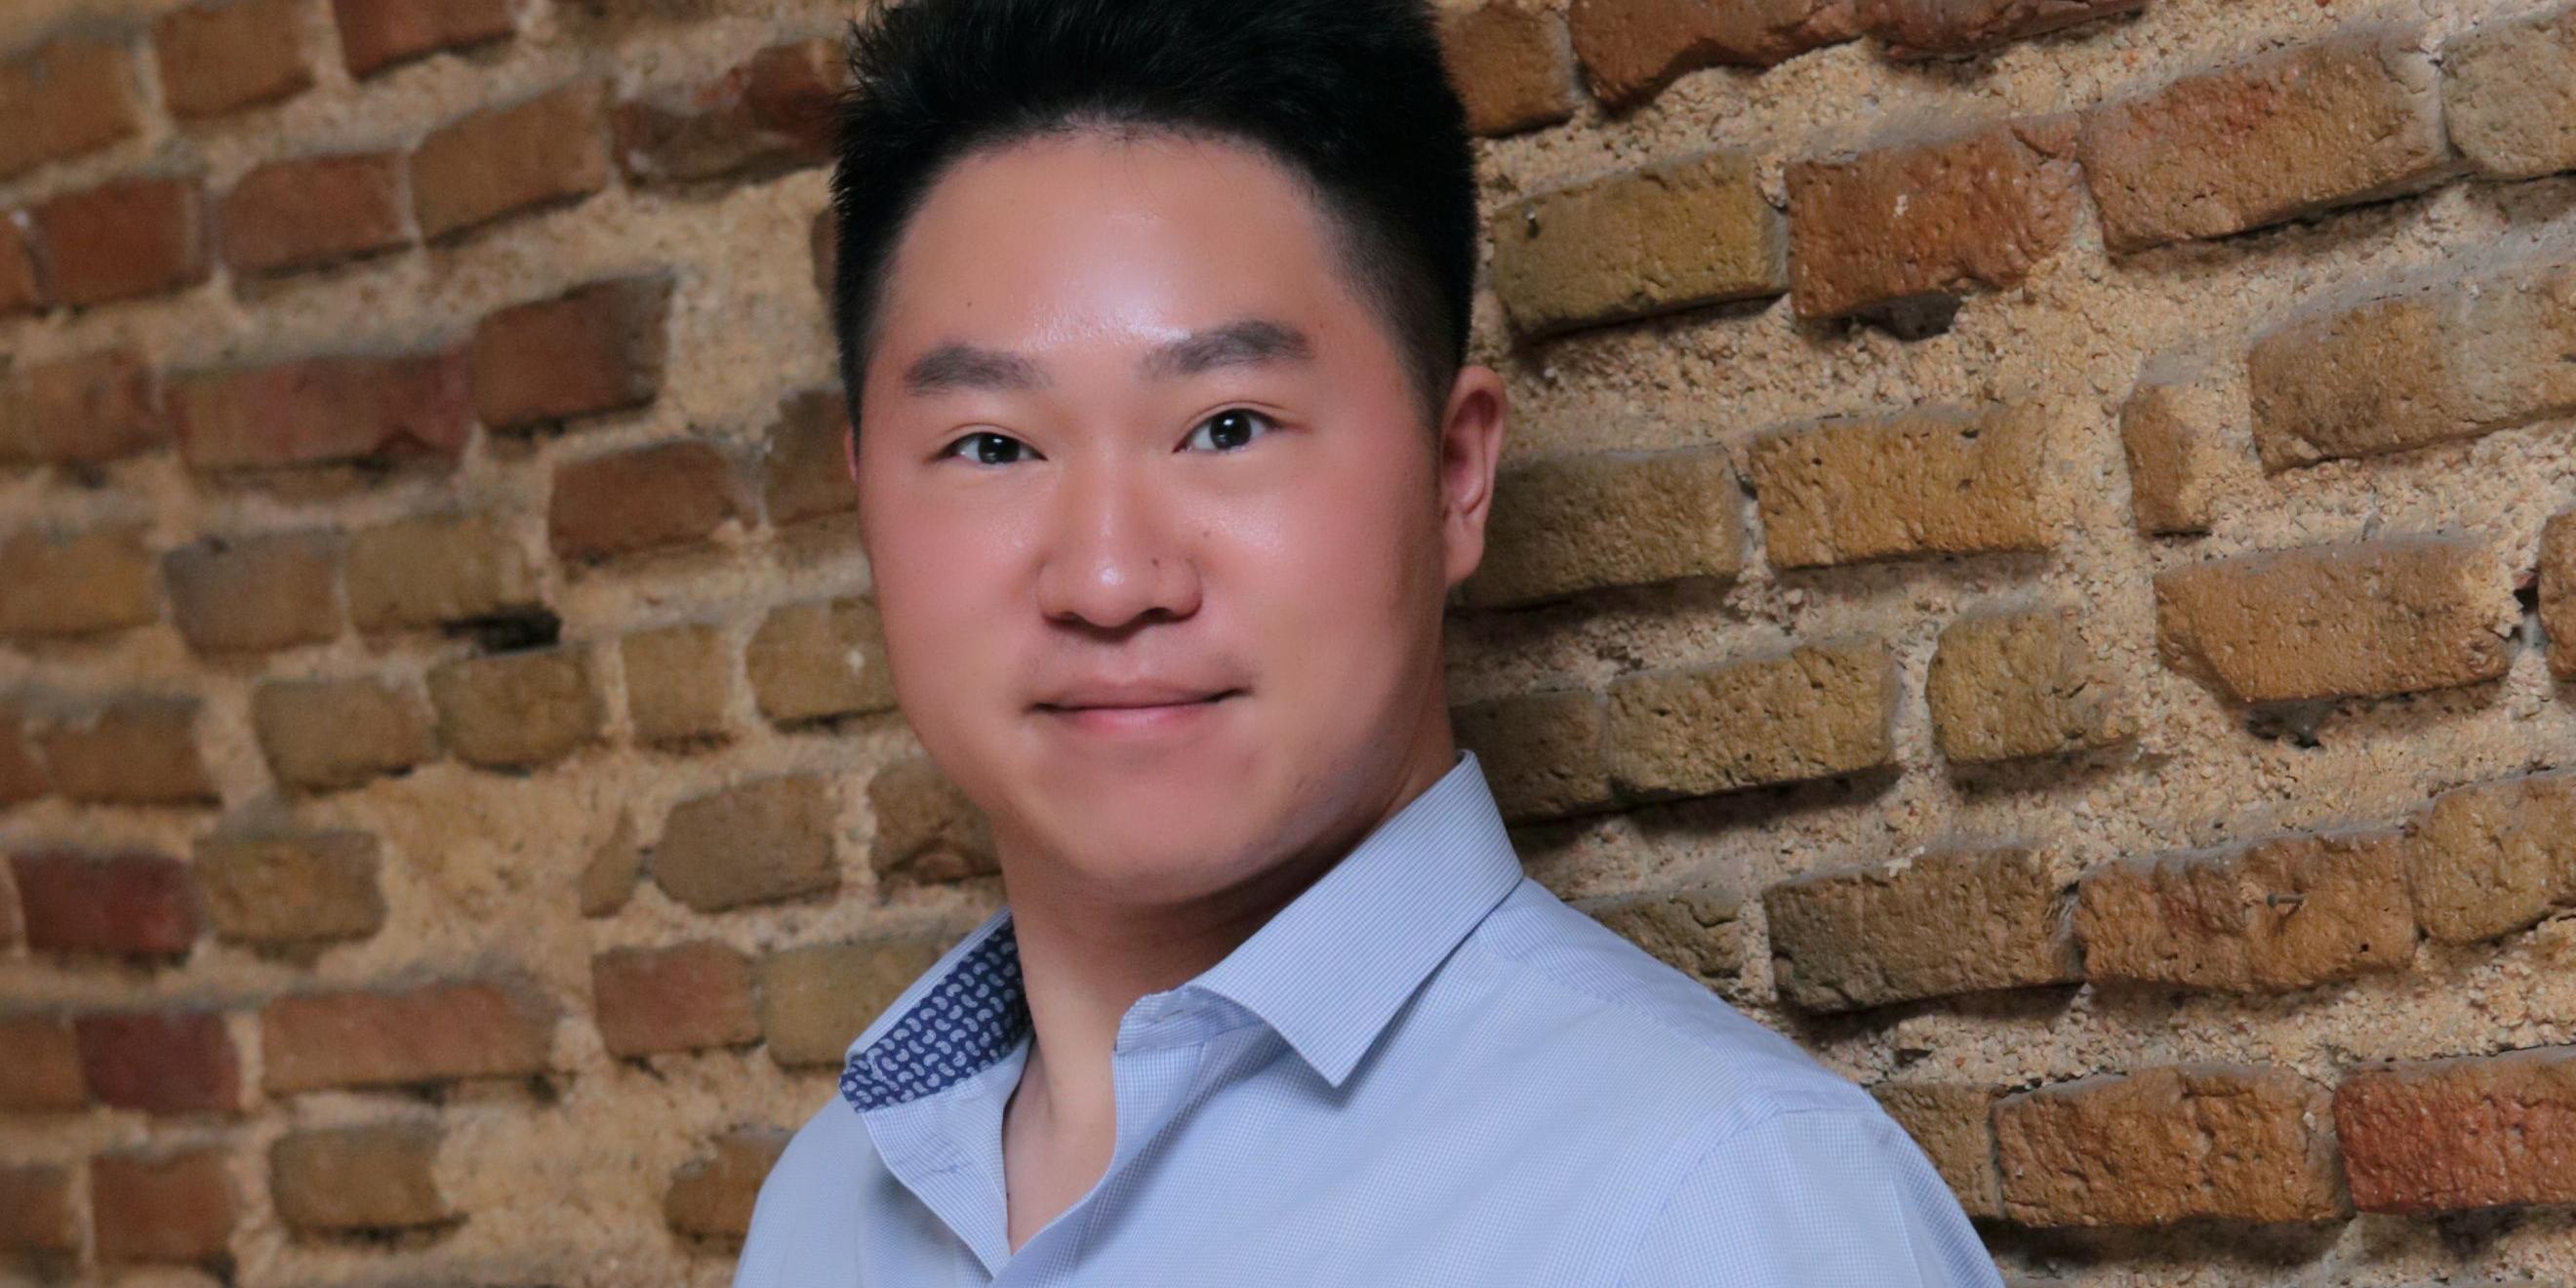 Zhenyu Zheng, China, participant in the GCLP 2017 edition